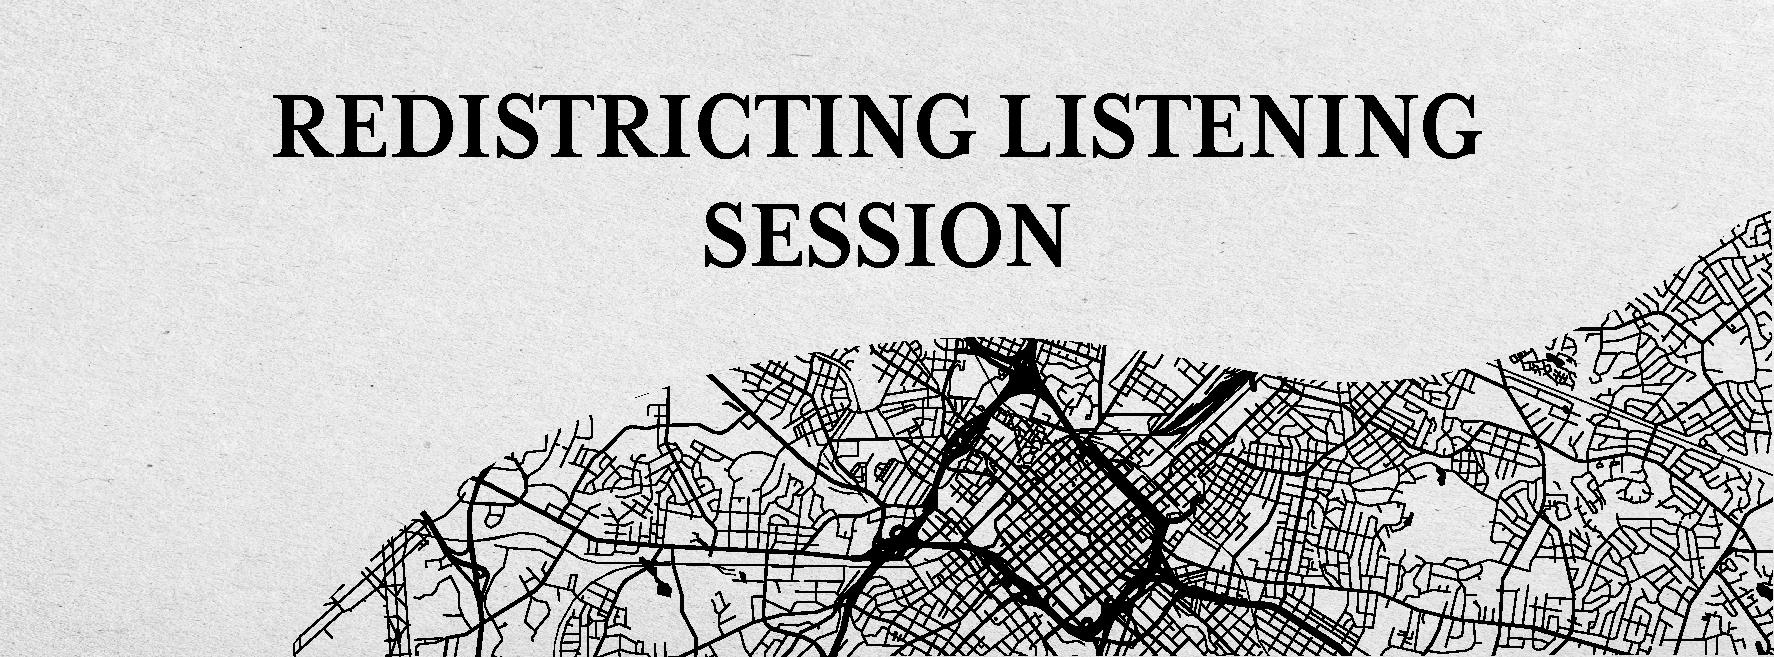 Redistricting Listening Session